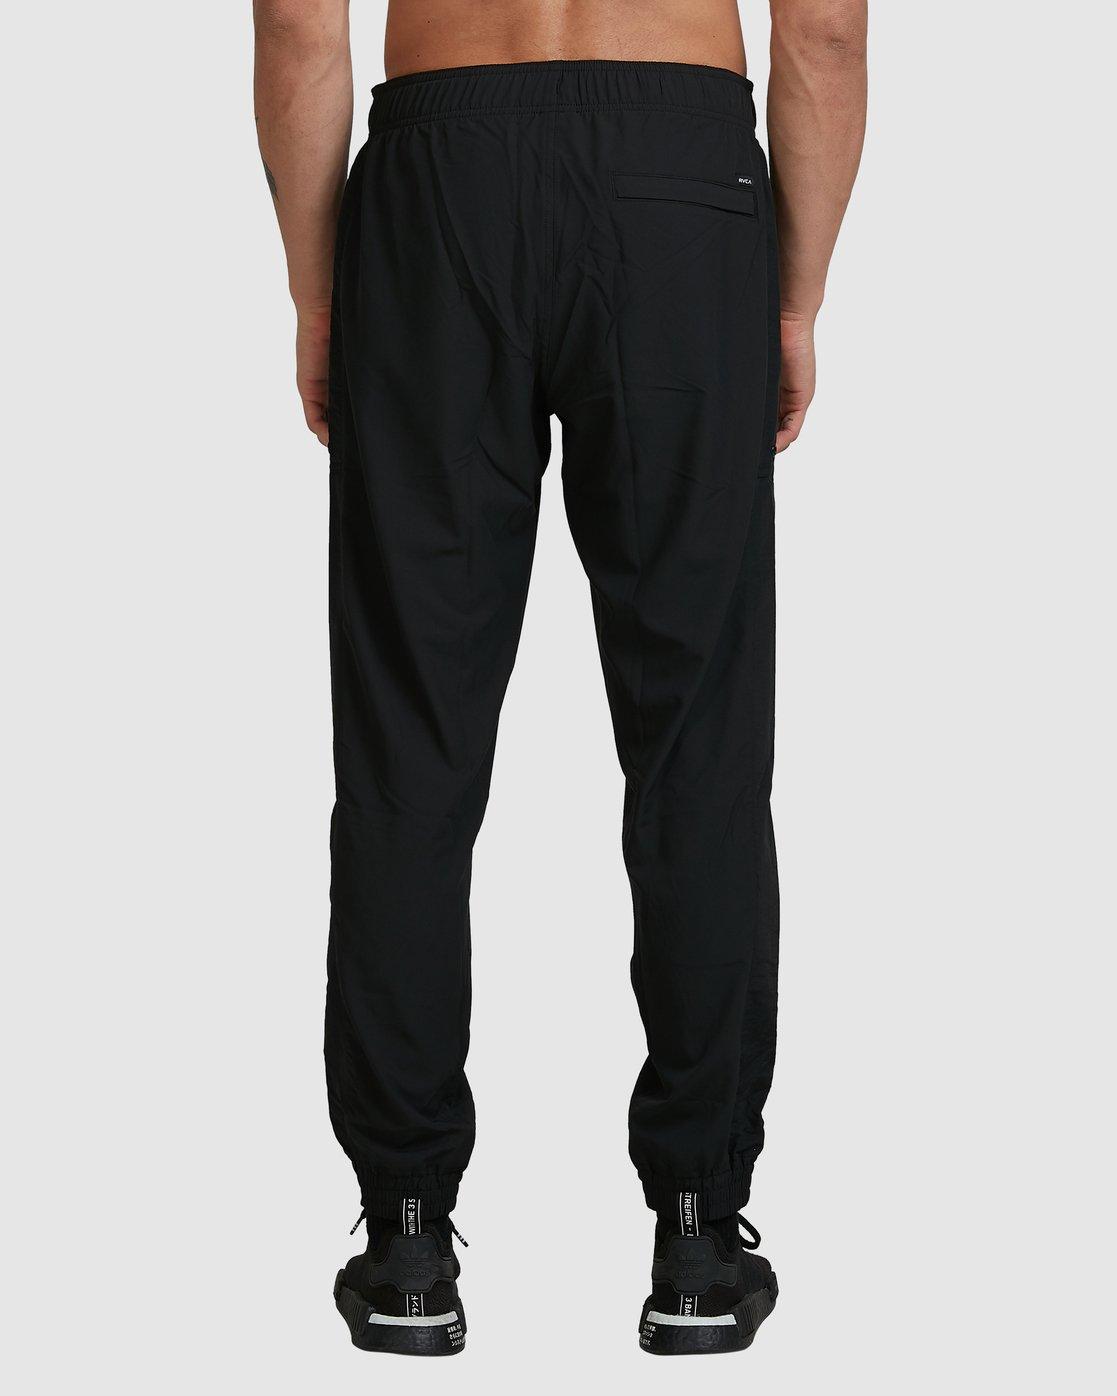 2 YOGGER PANTS Black R307275 RVCA